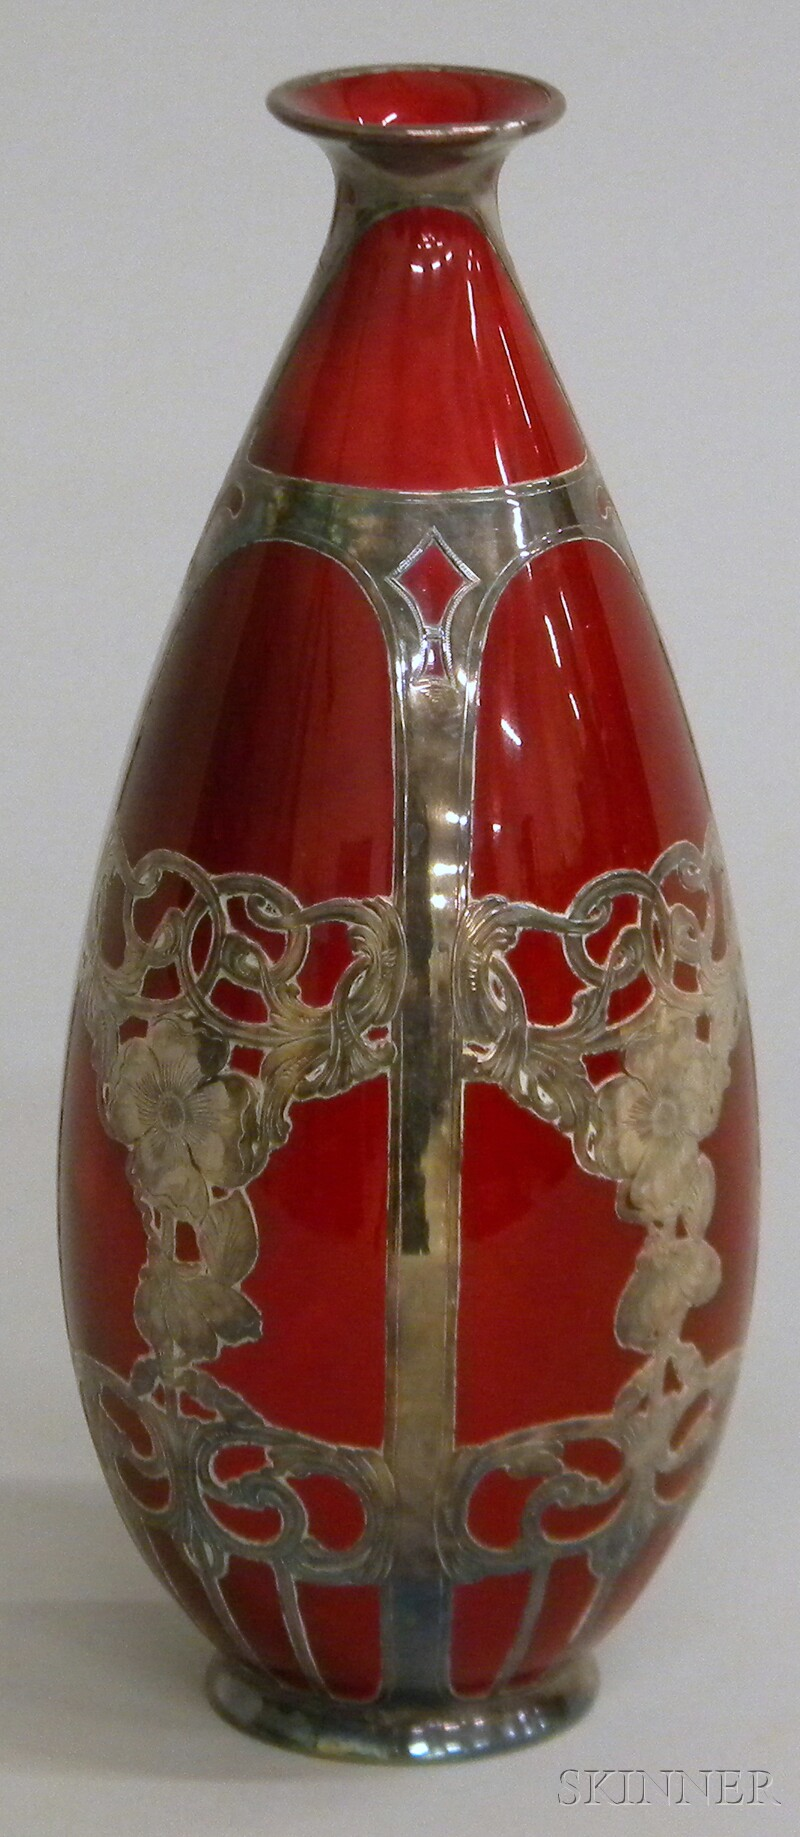 Royal Doulton Sterling Silver Overlay Flambe Glaze Ceramic Vase